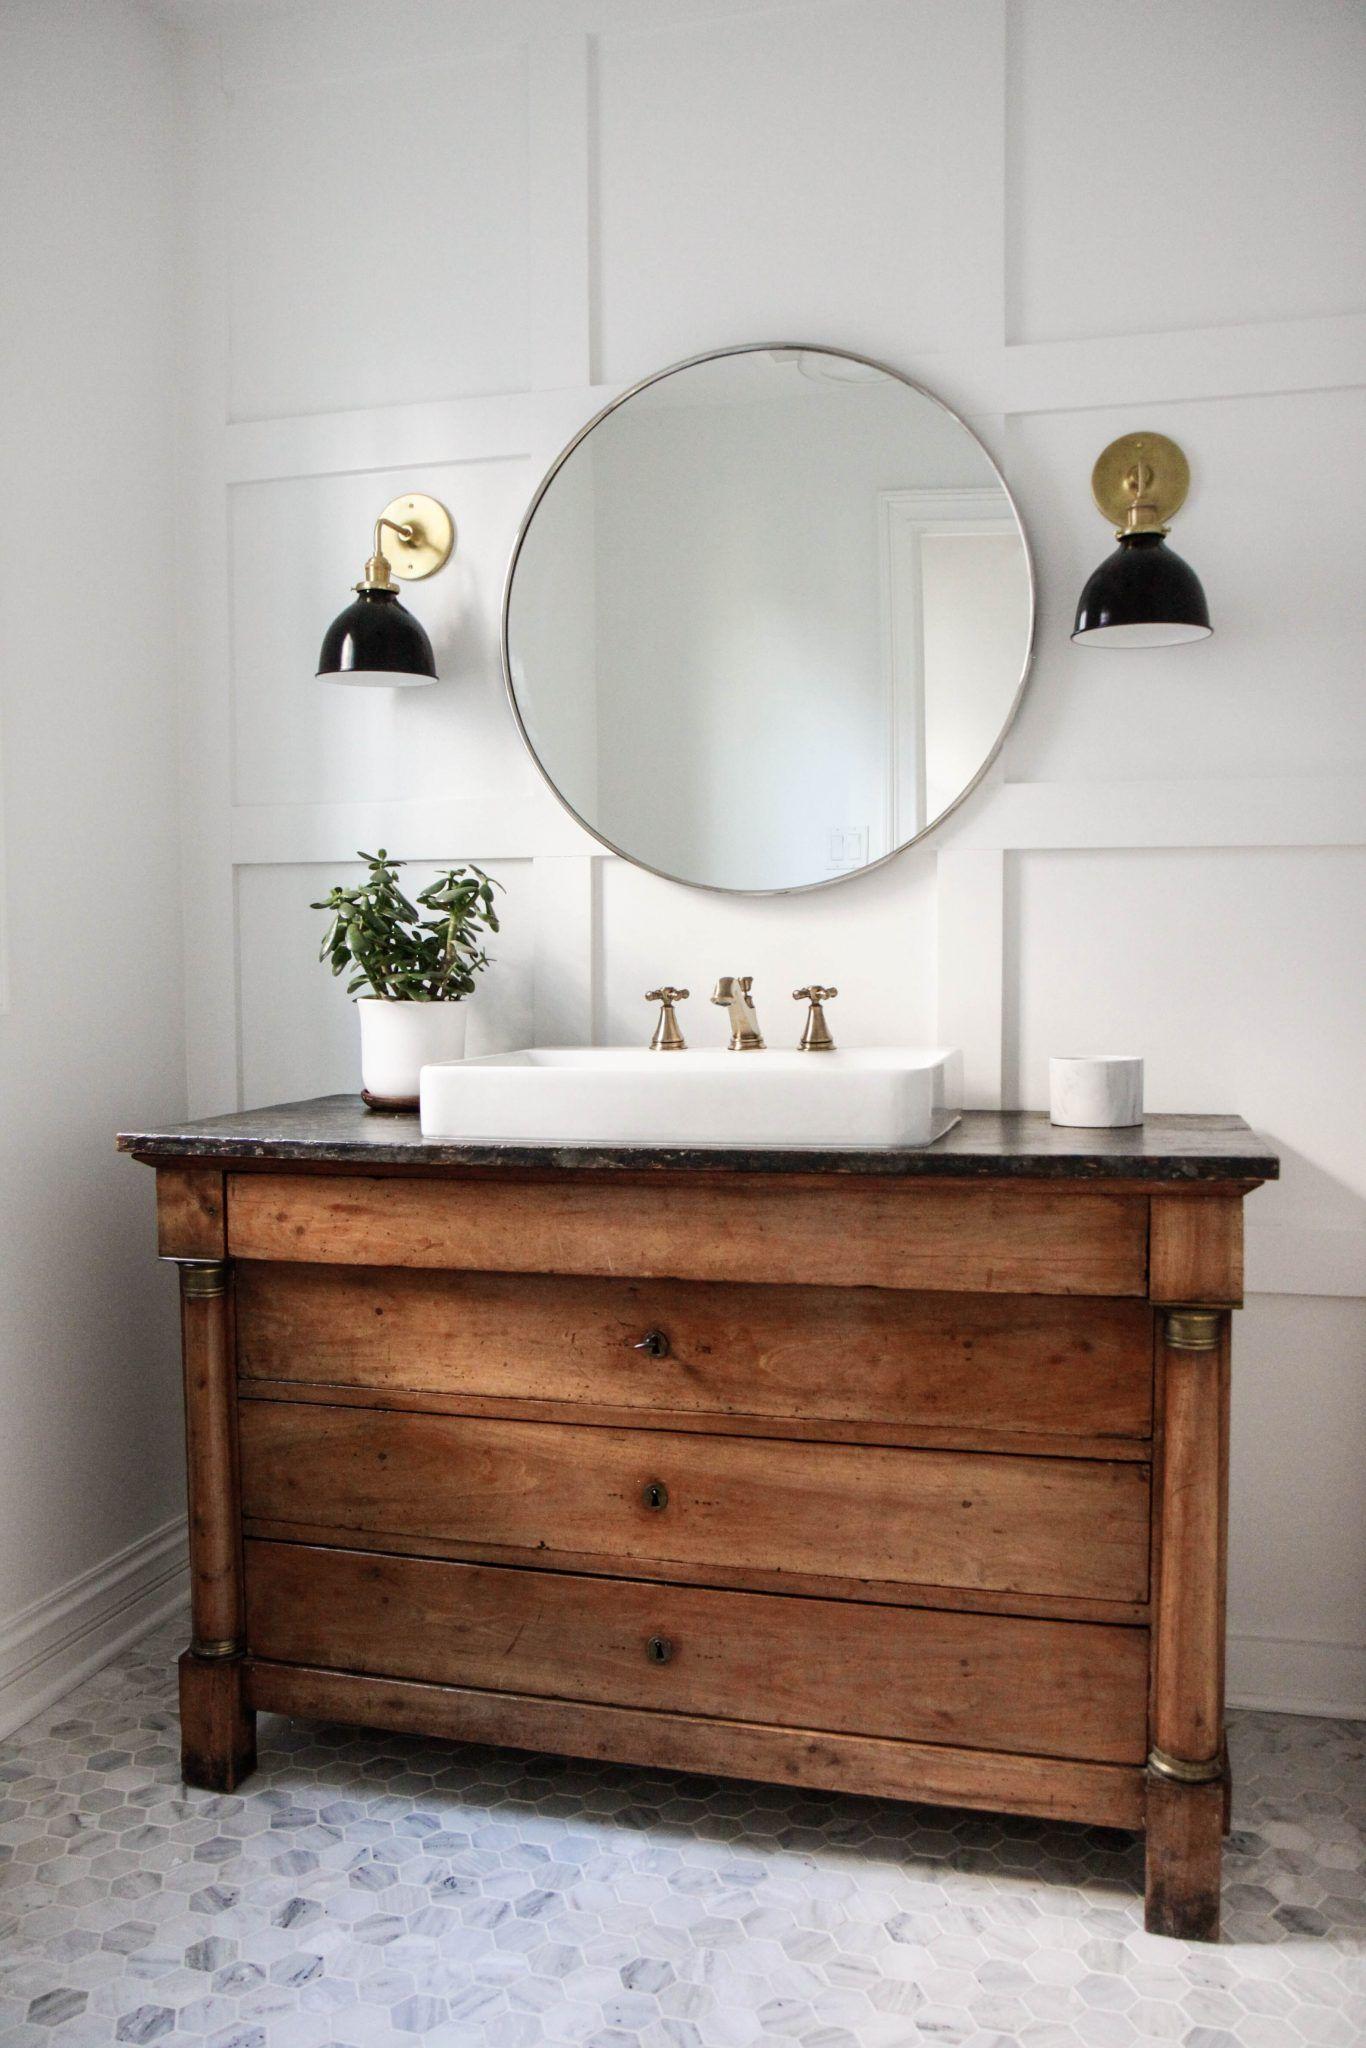 Meuble Salle De Bain Love ~ love this vanity innuti pinterest salle de bains salle et lavage